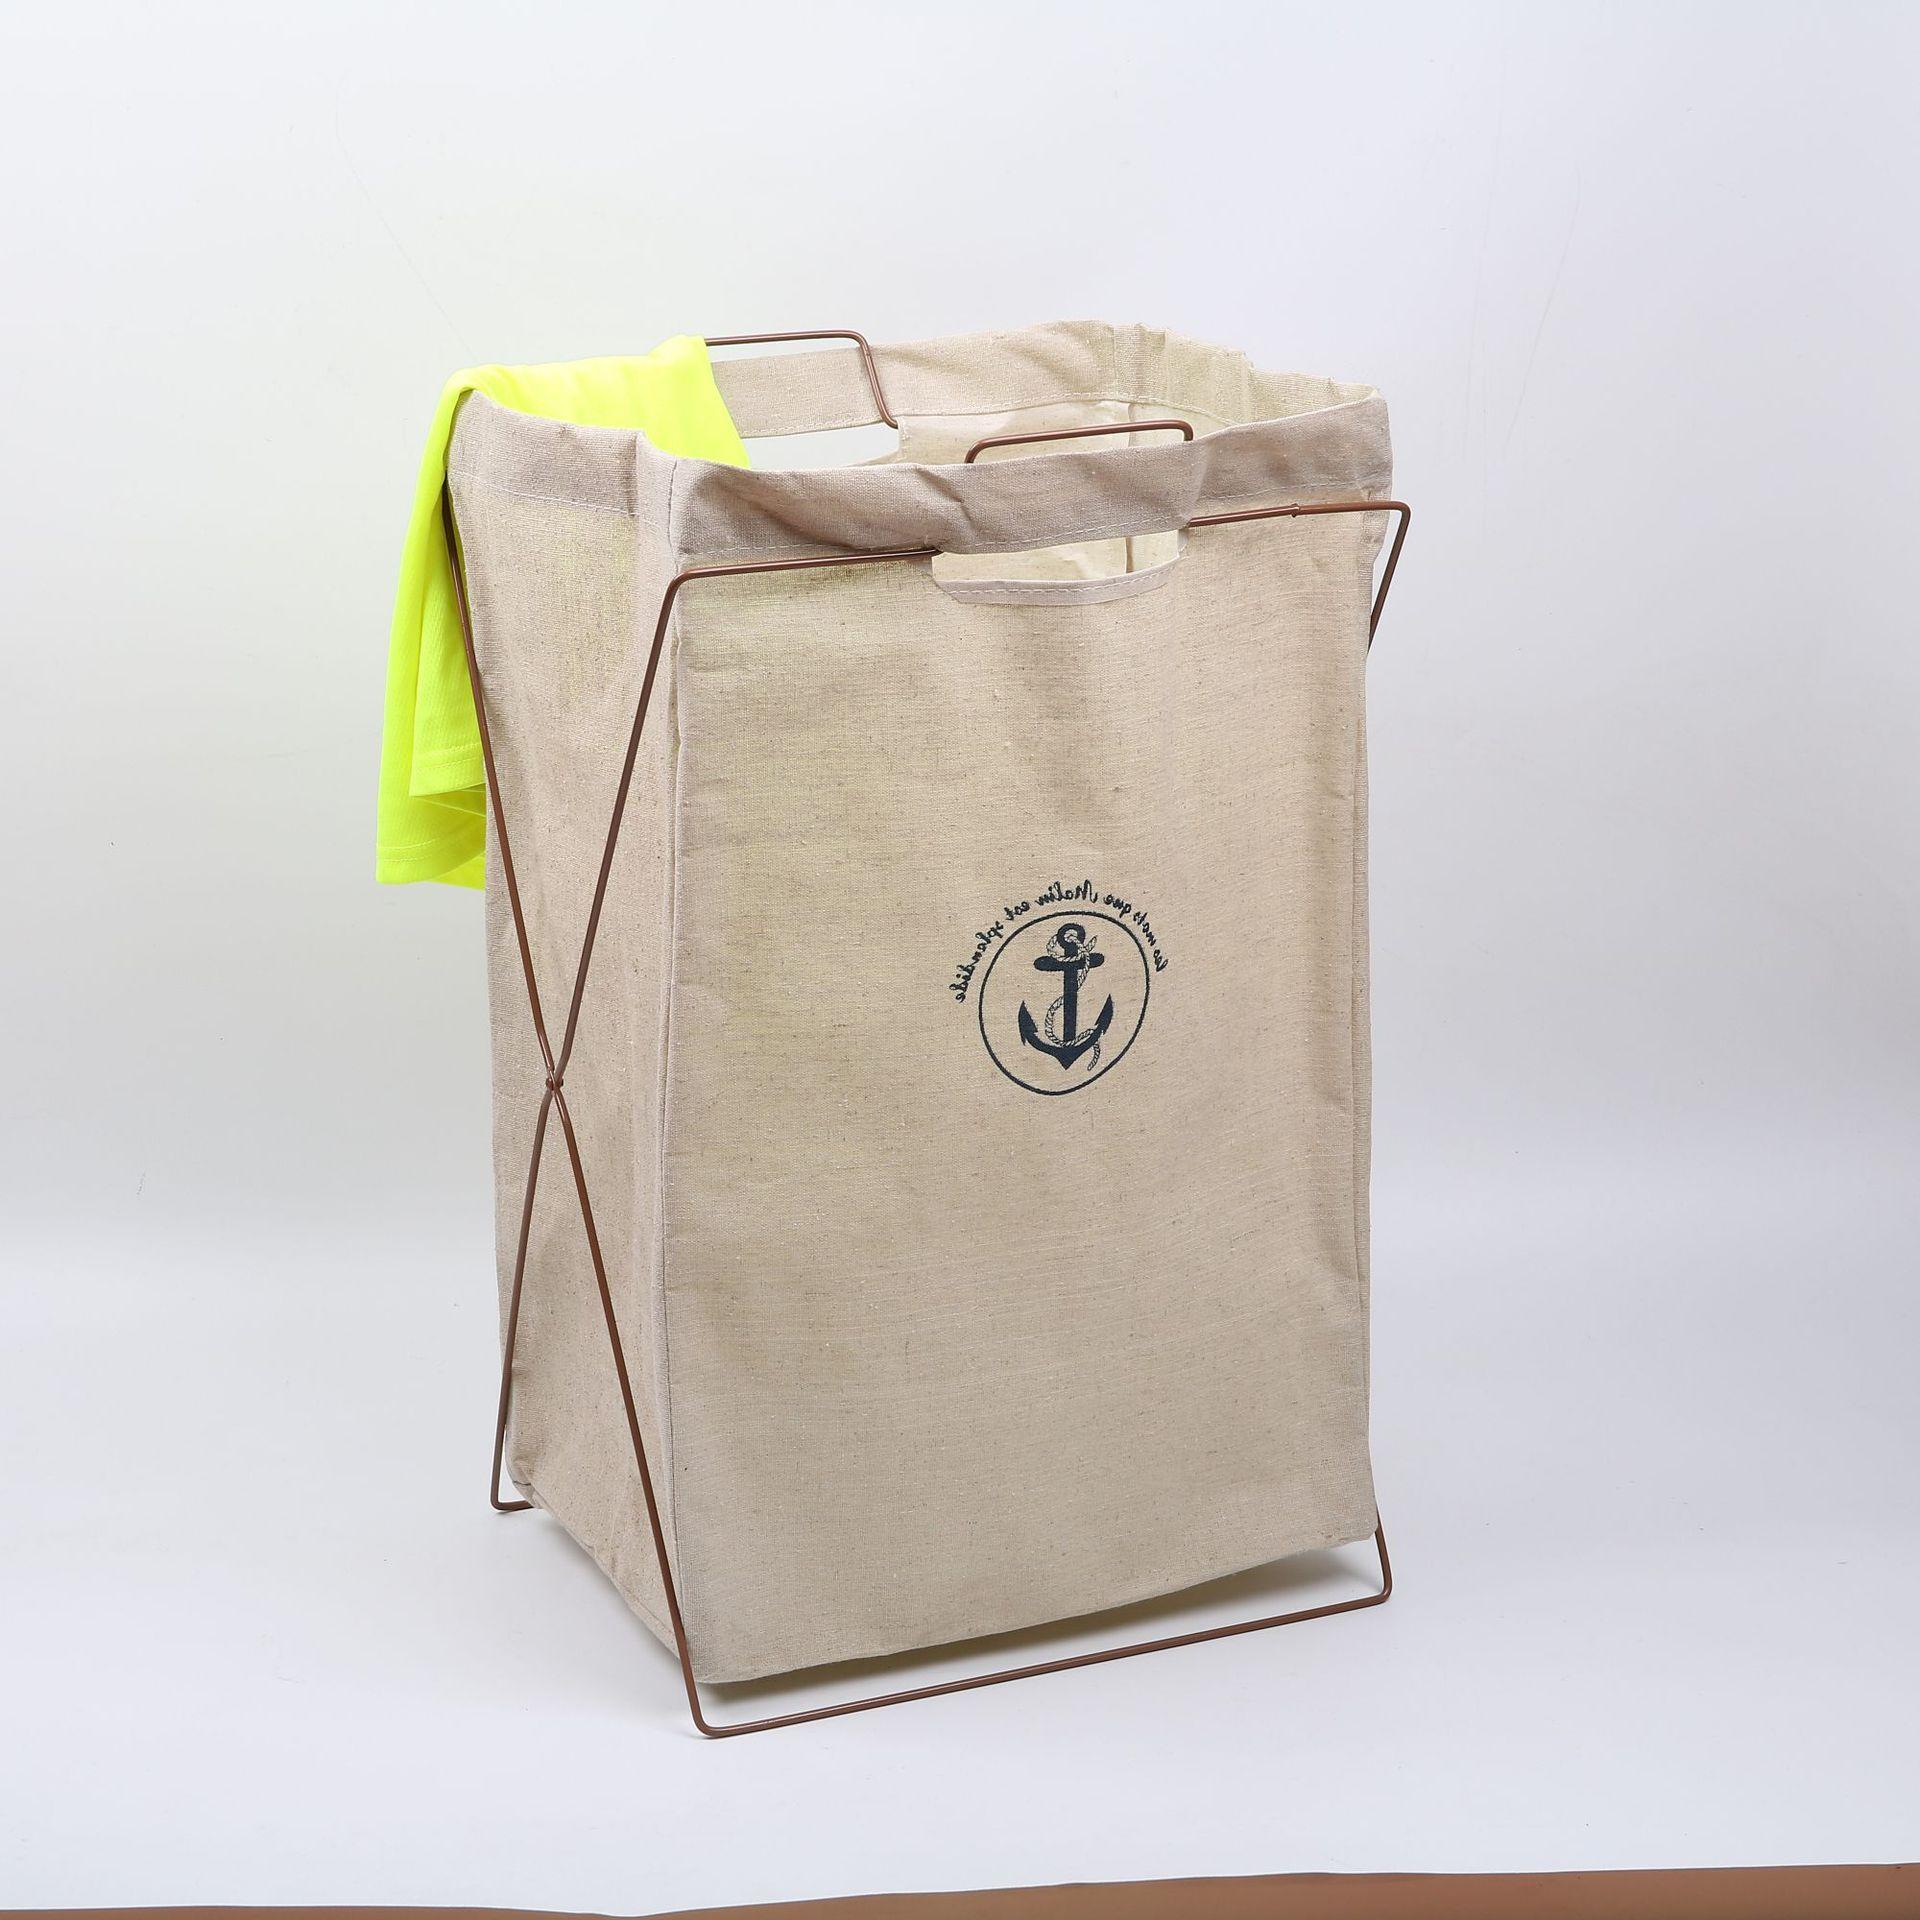 Shushi/shushi casa dobrável tecido cesta de roupa roupa suja roupa do banheiro ferro cesta armazenamento